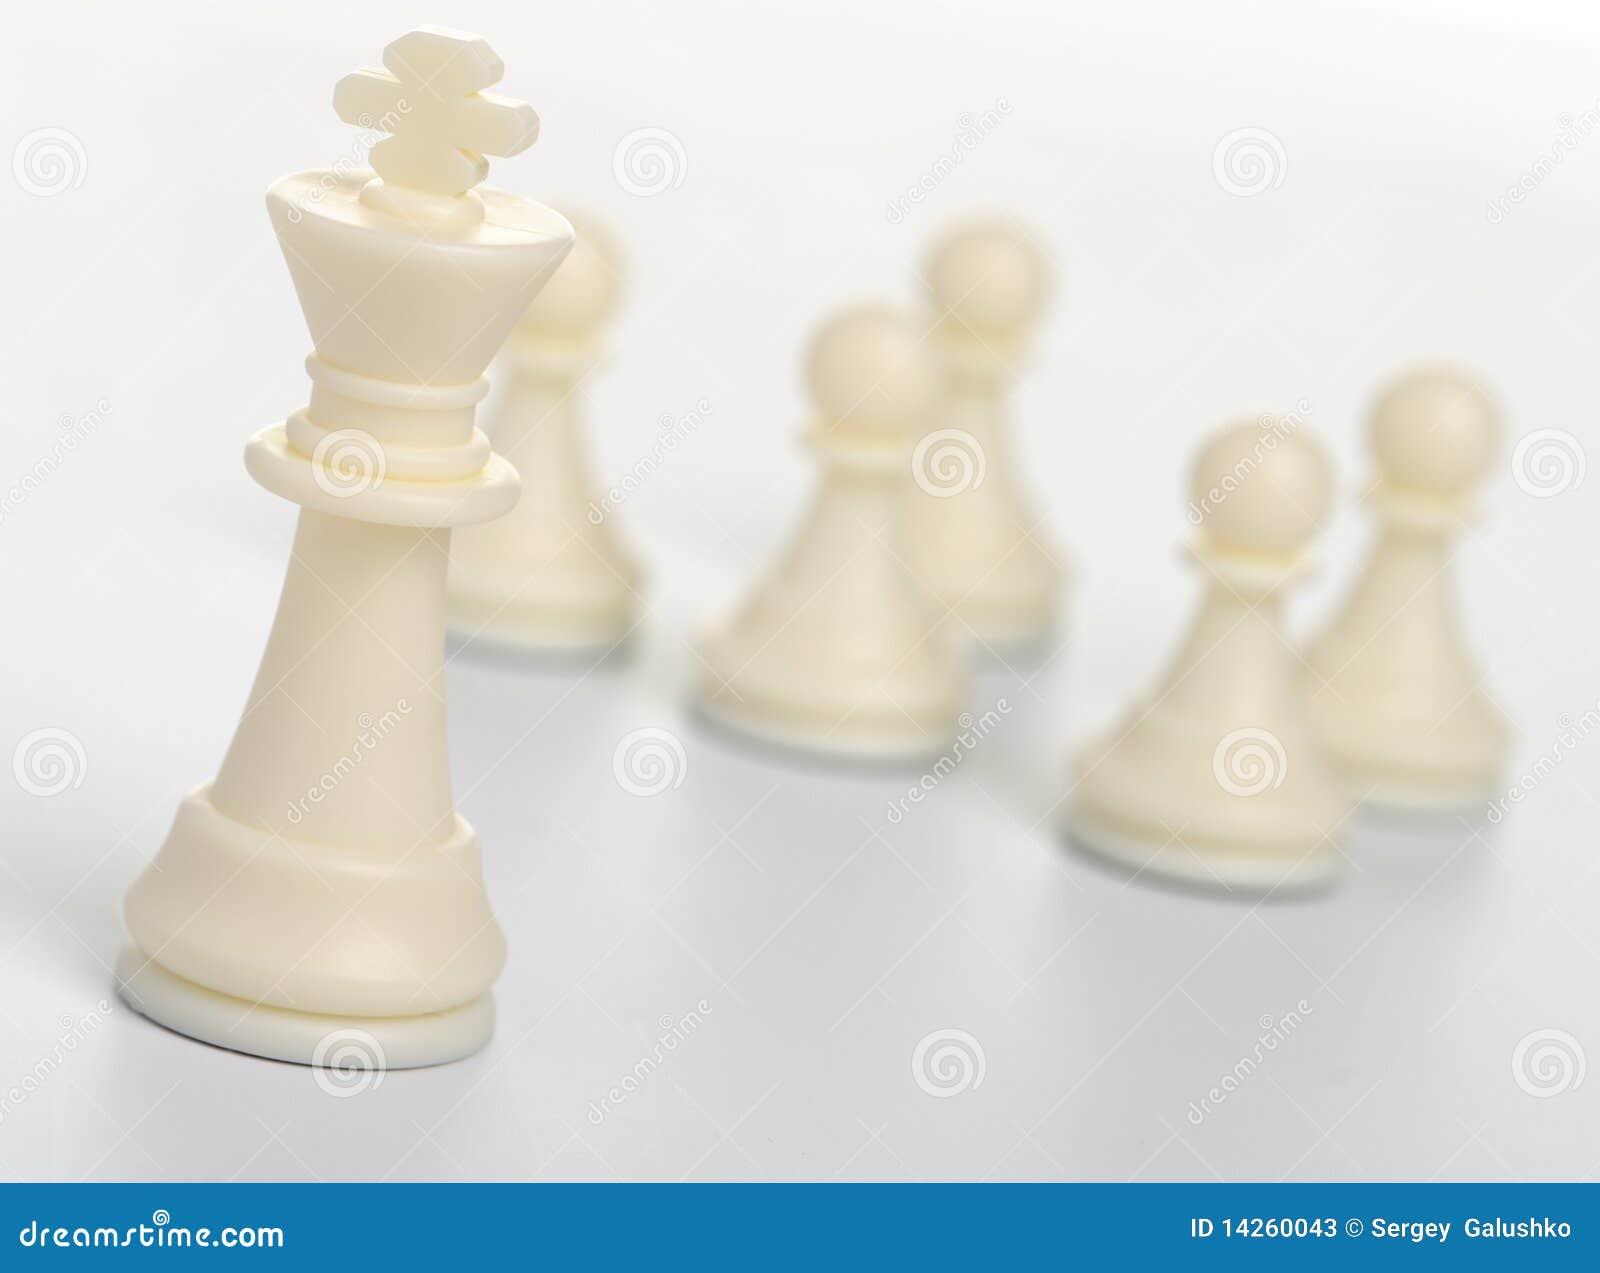 Schachabbildung - König